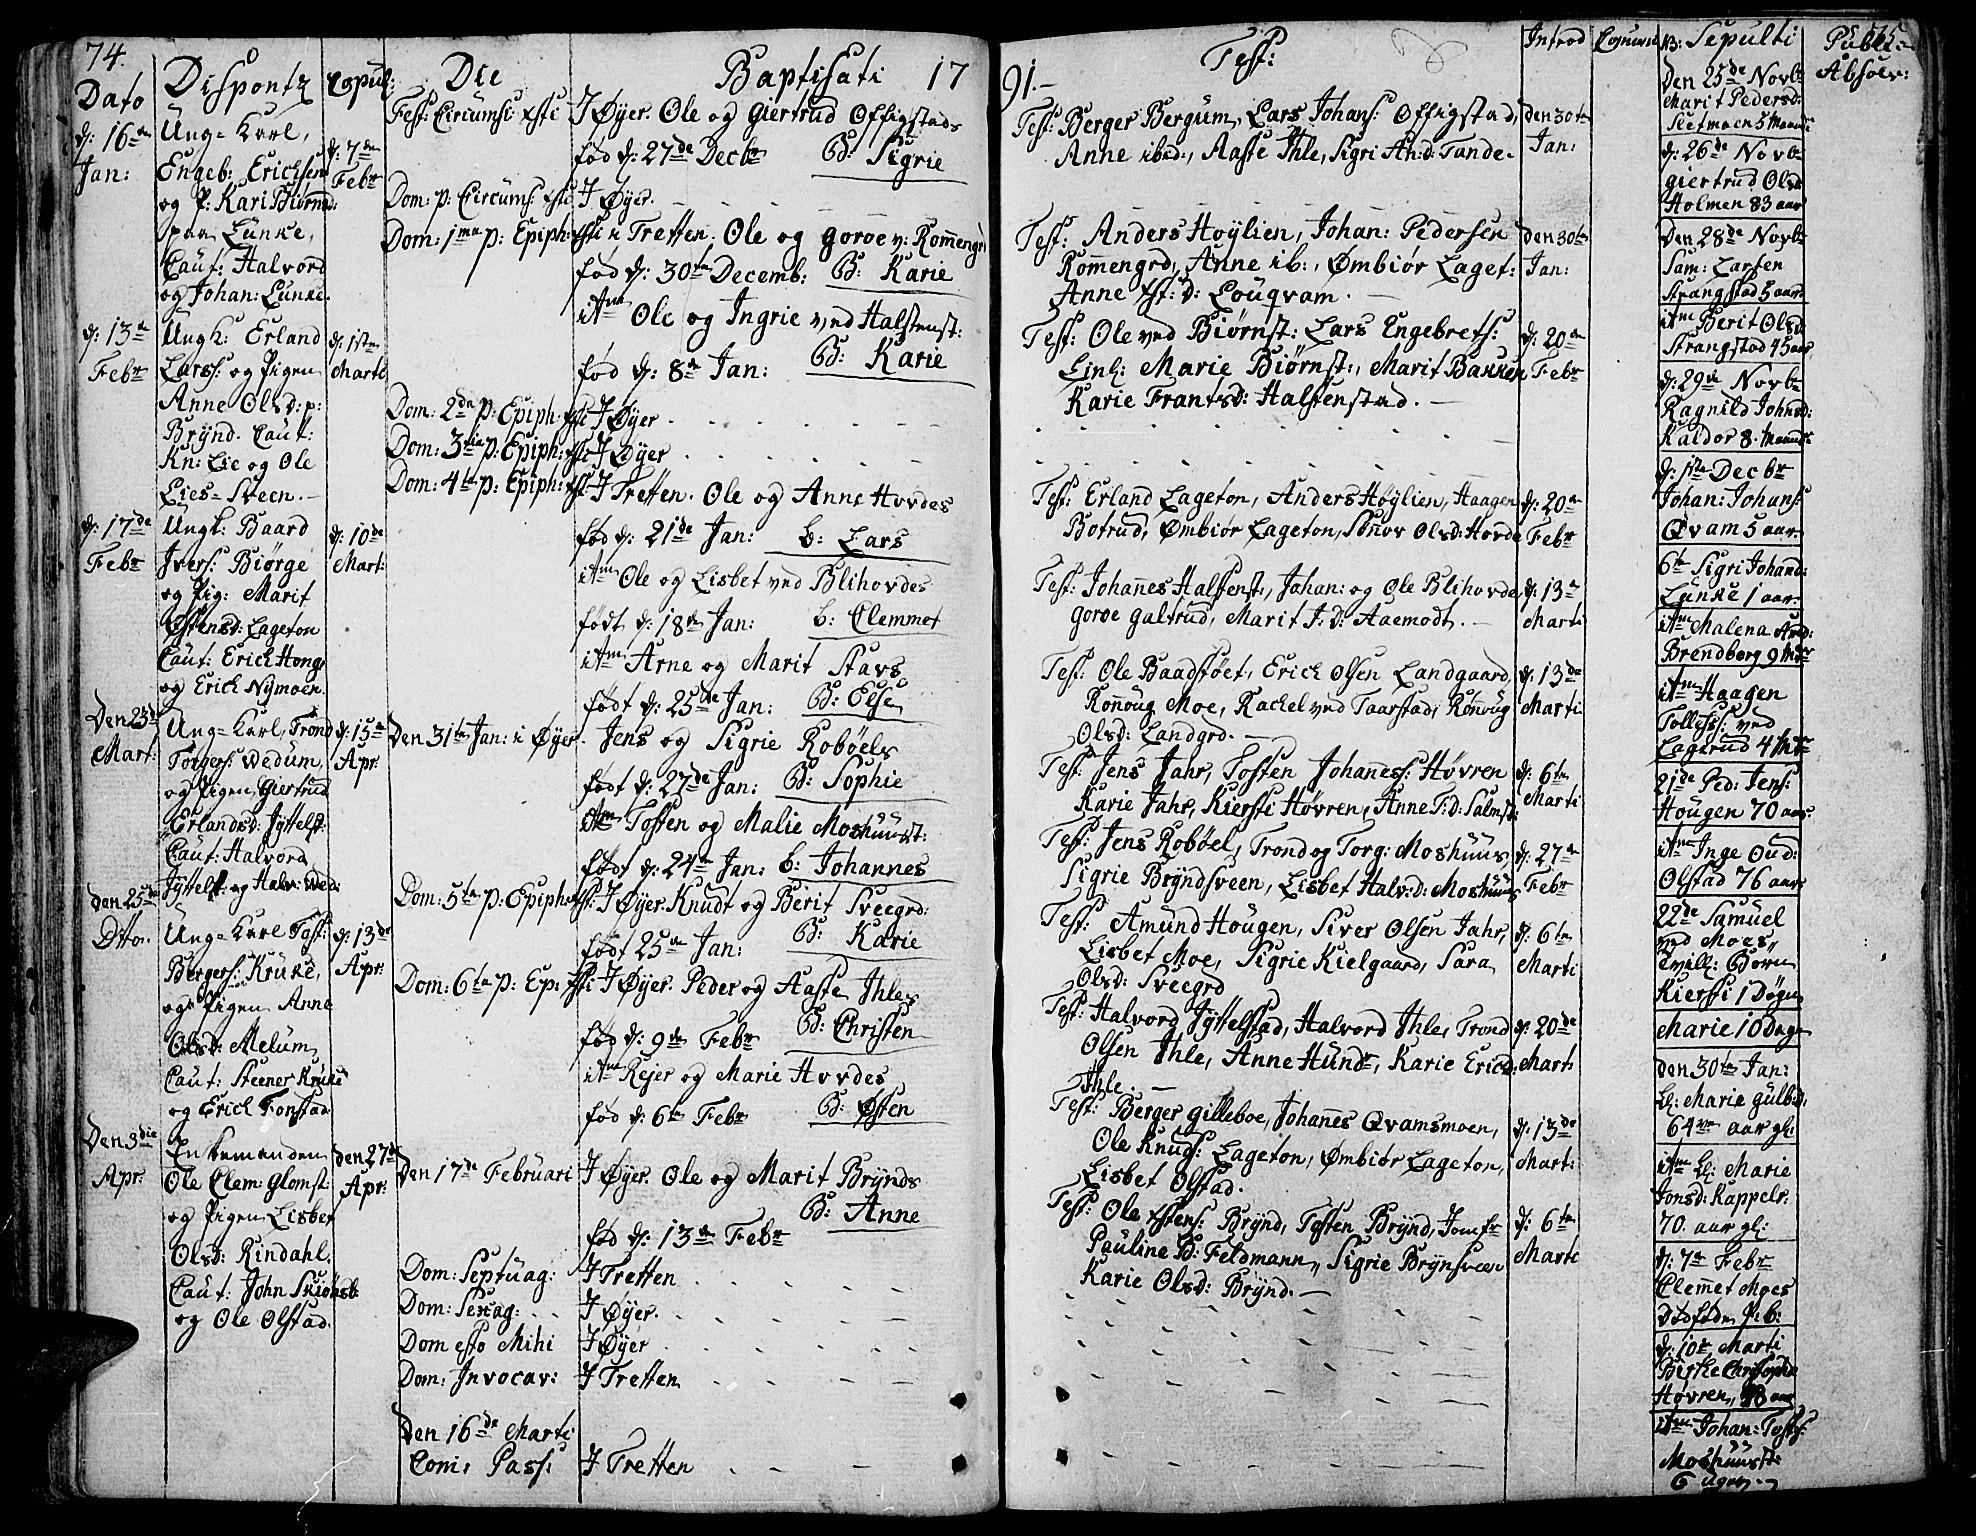 SAH, Øyer prestekontor, Ministerialbok nr. 3, 1784-1824, s. 74-75